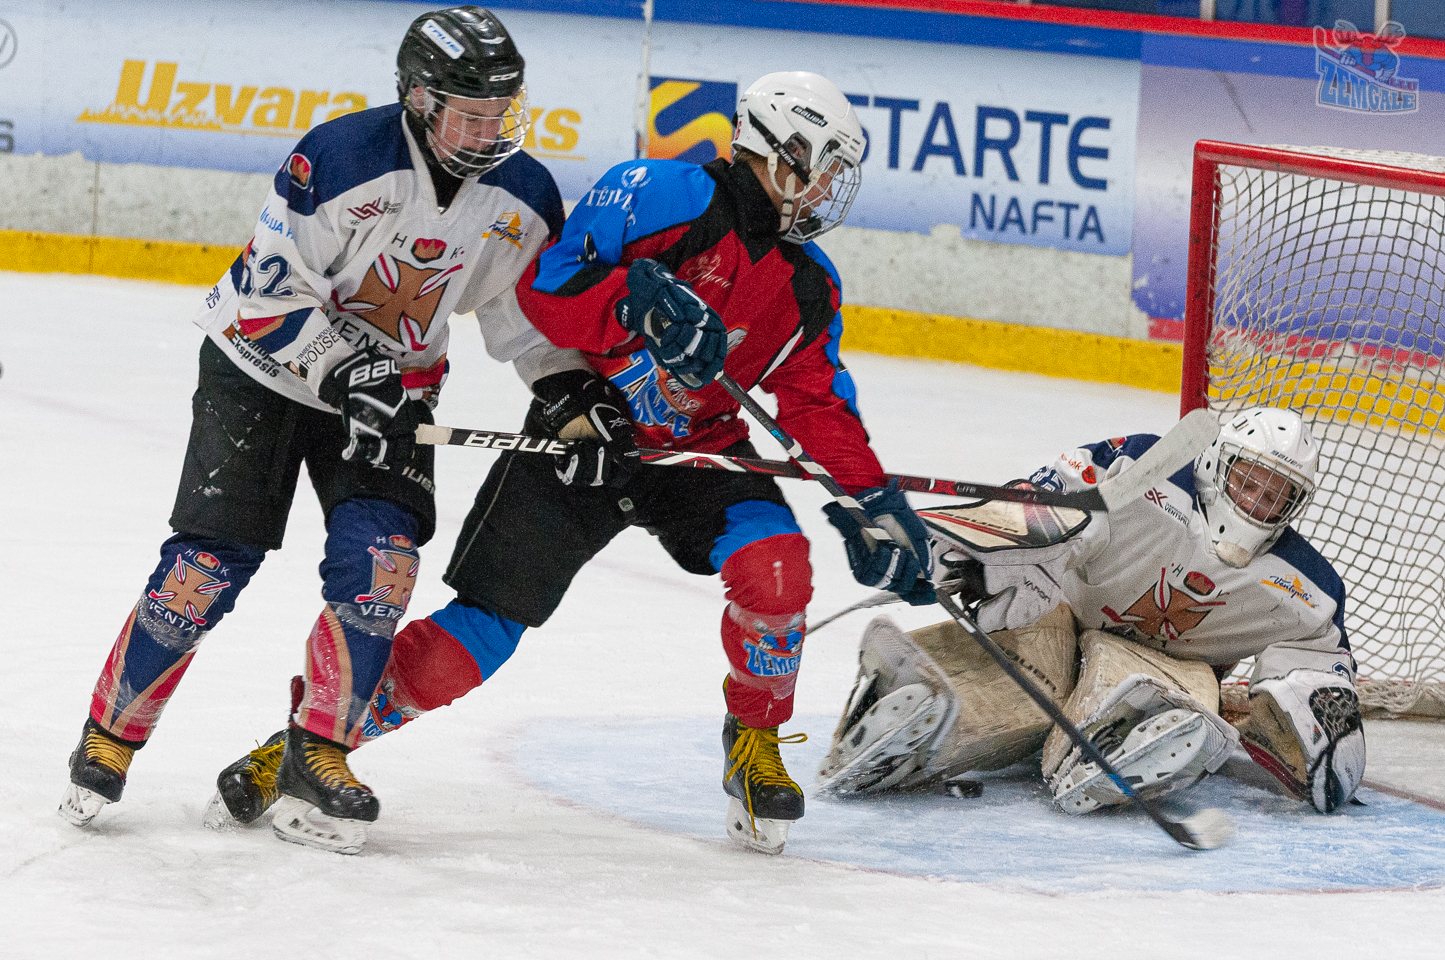 Jelgavas hokeja skola JLSS U17 - Venta 2002 14092019-31